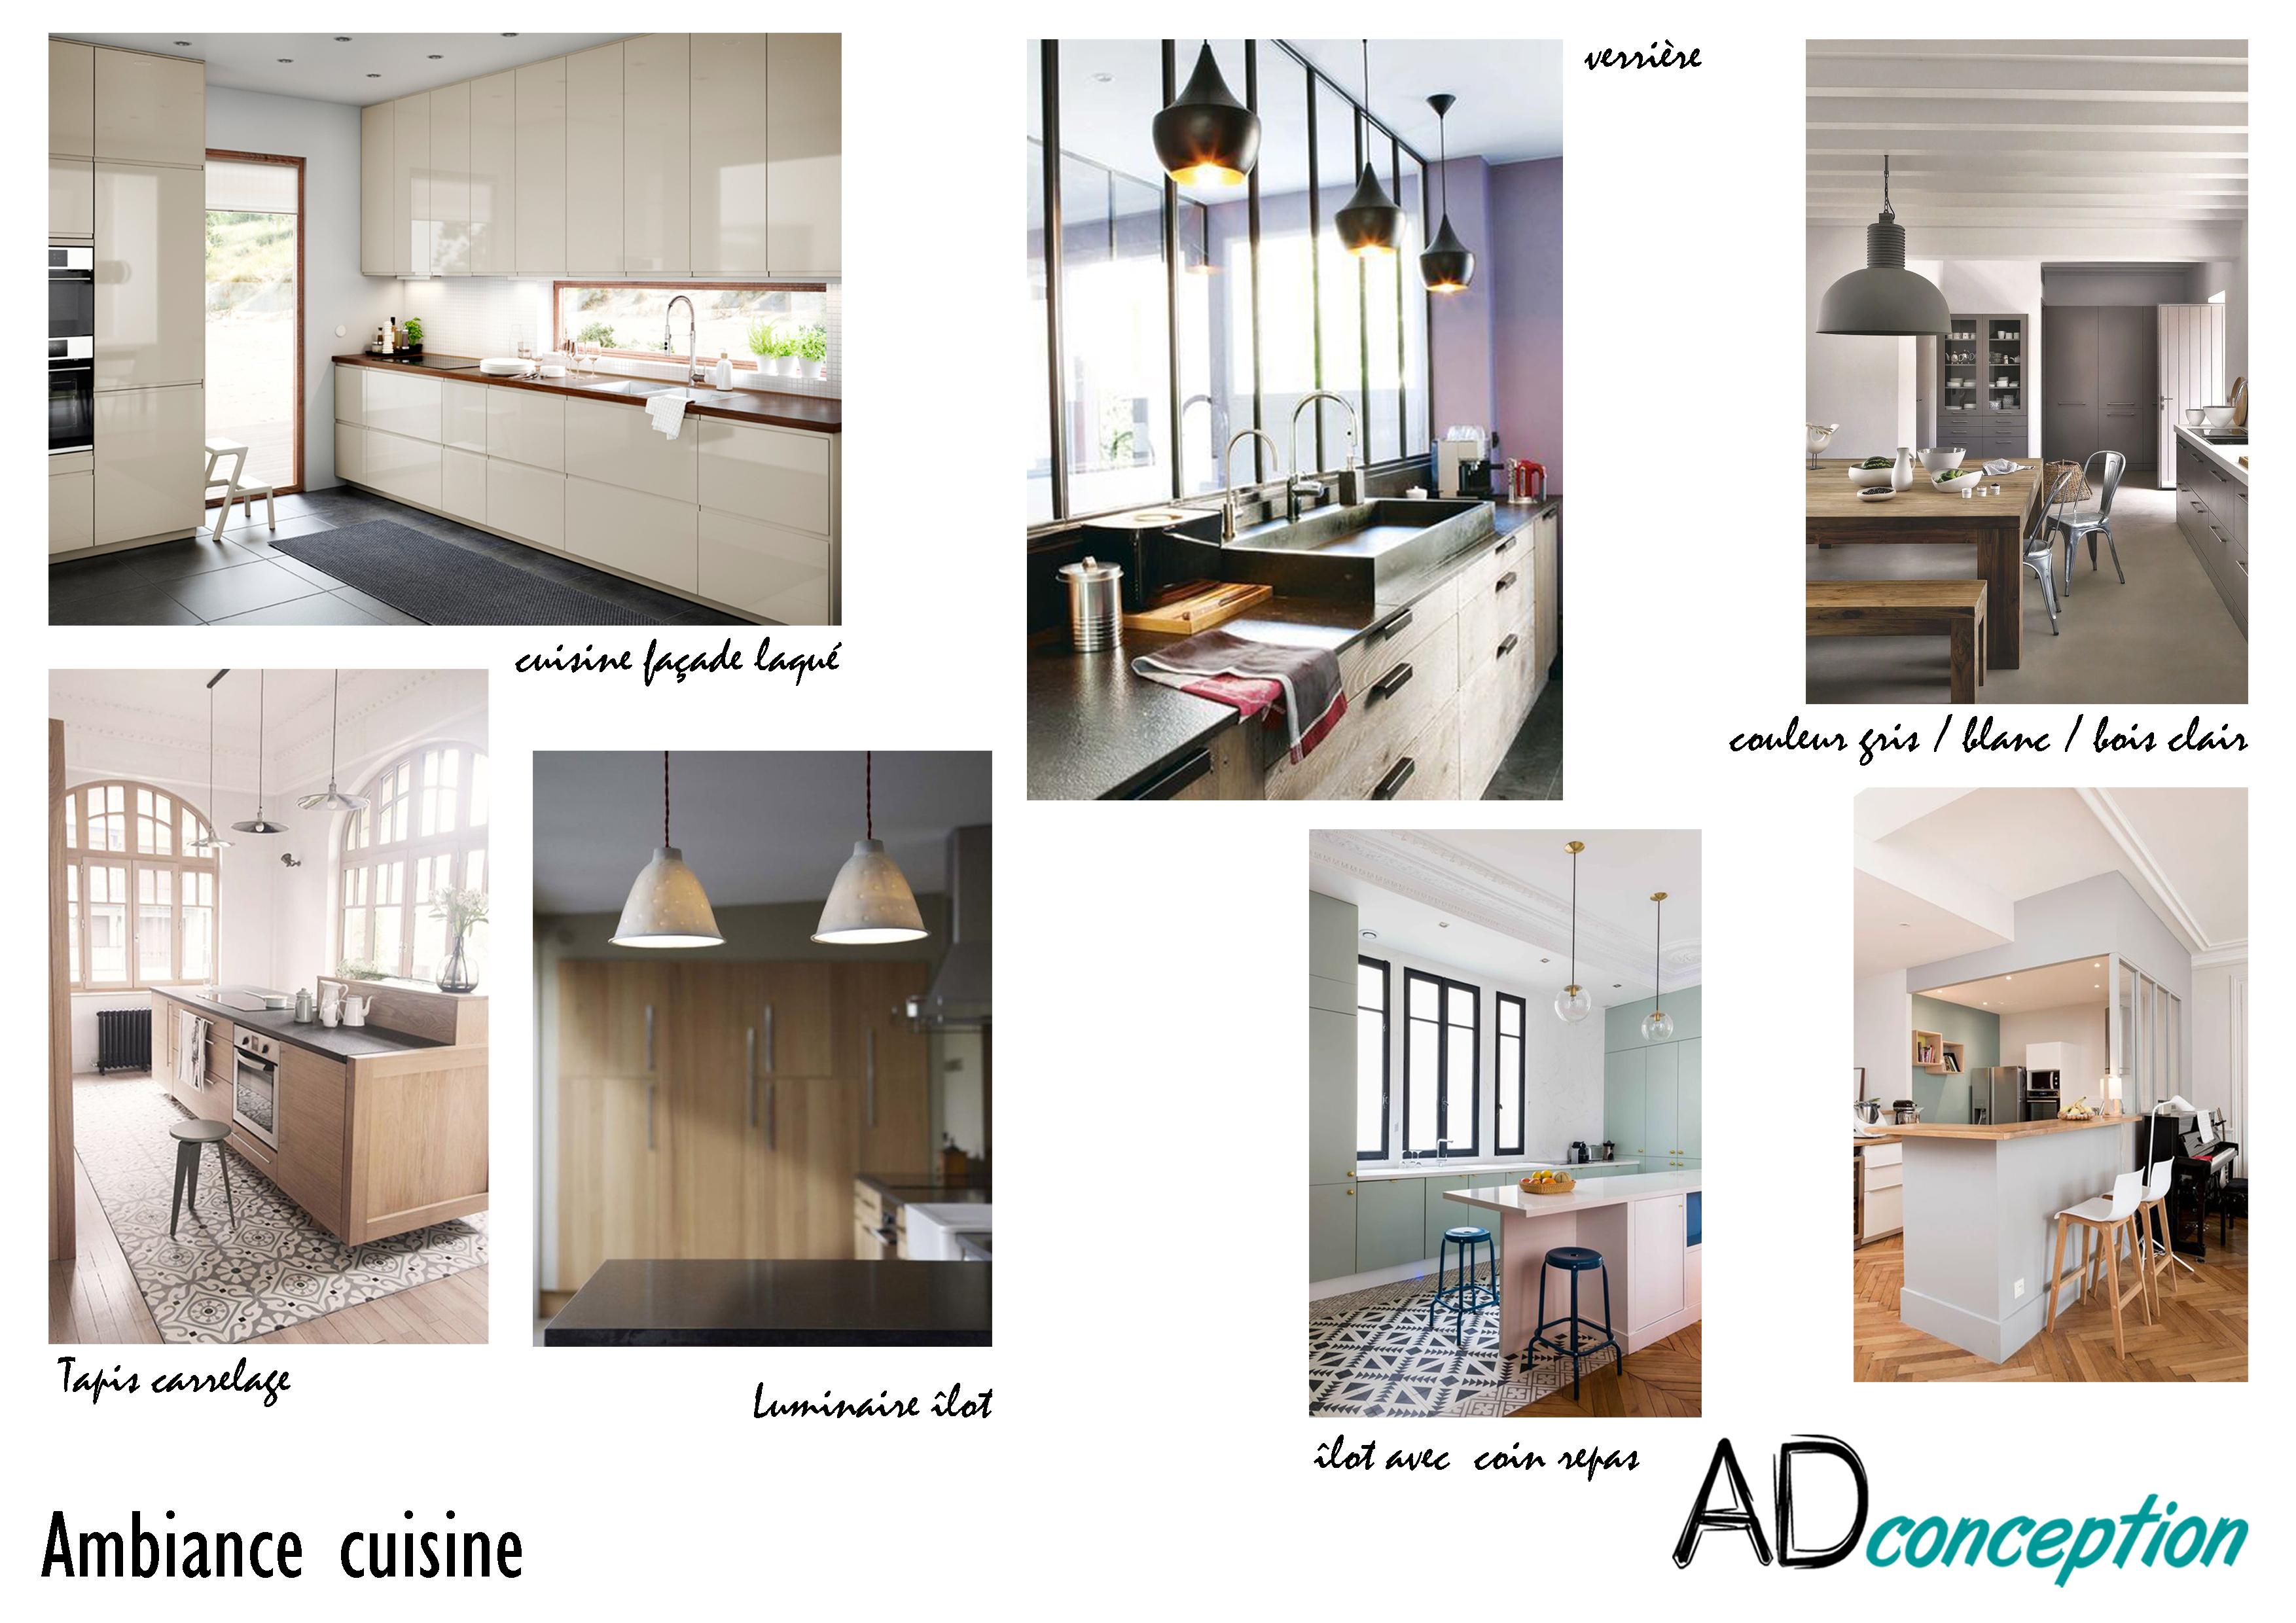 ambiance cuisine p1